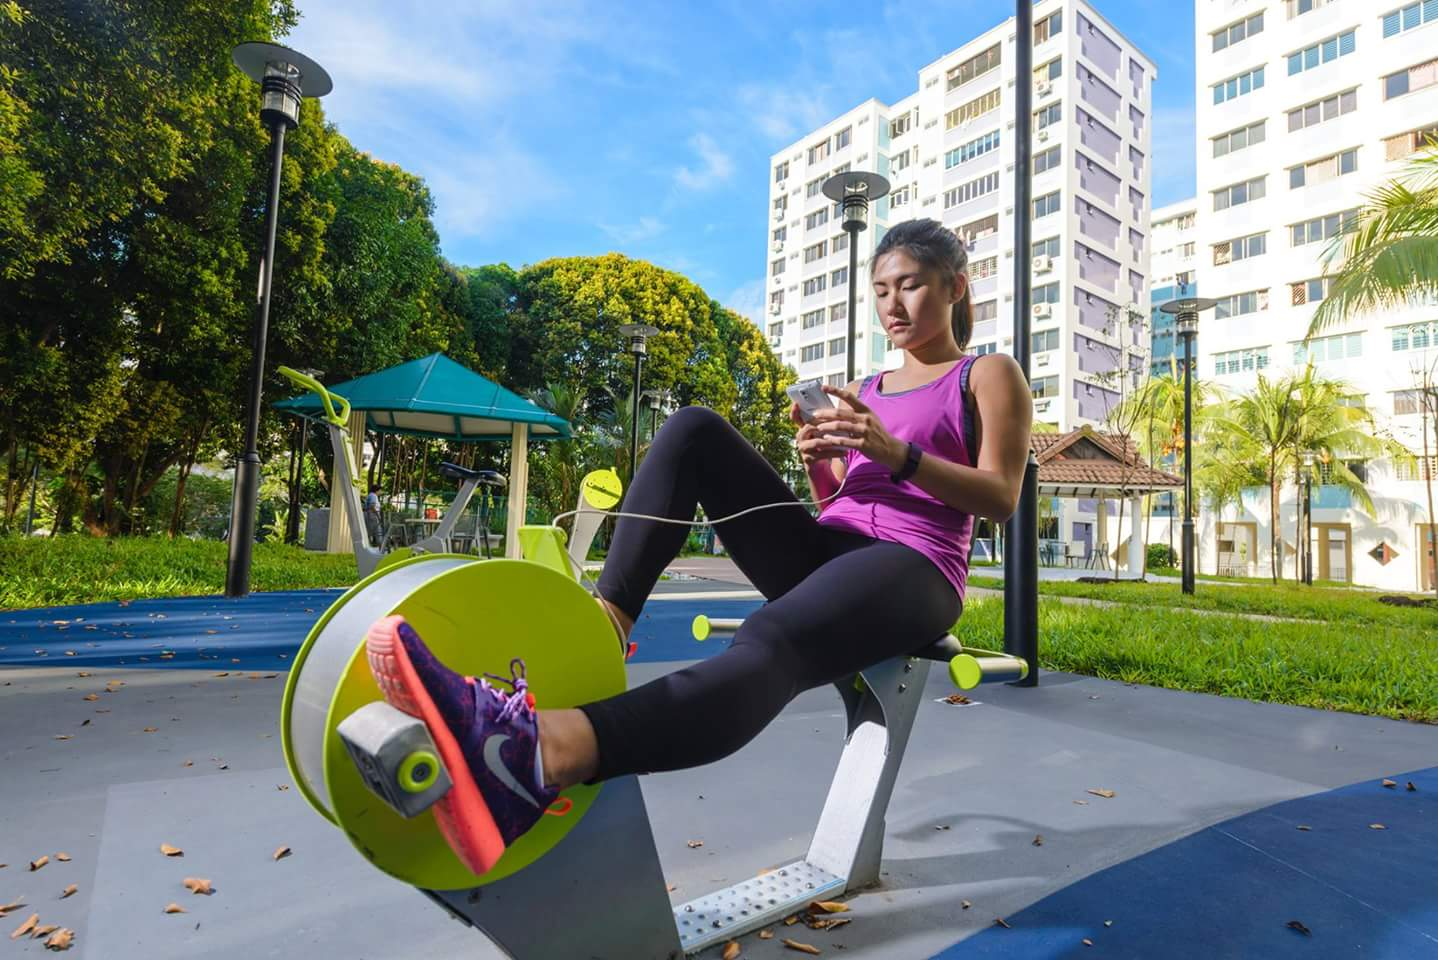 Energy Phone Charging Recumbent  Bike, Singapore © Mondo Spa